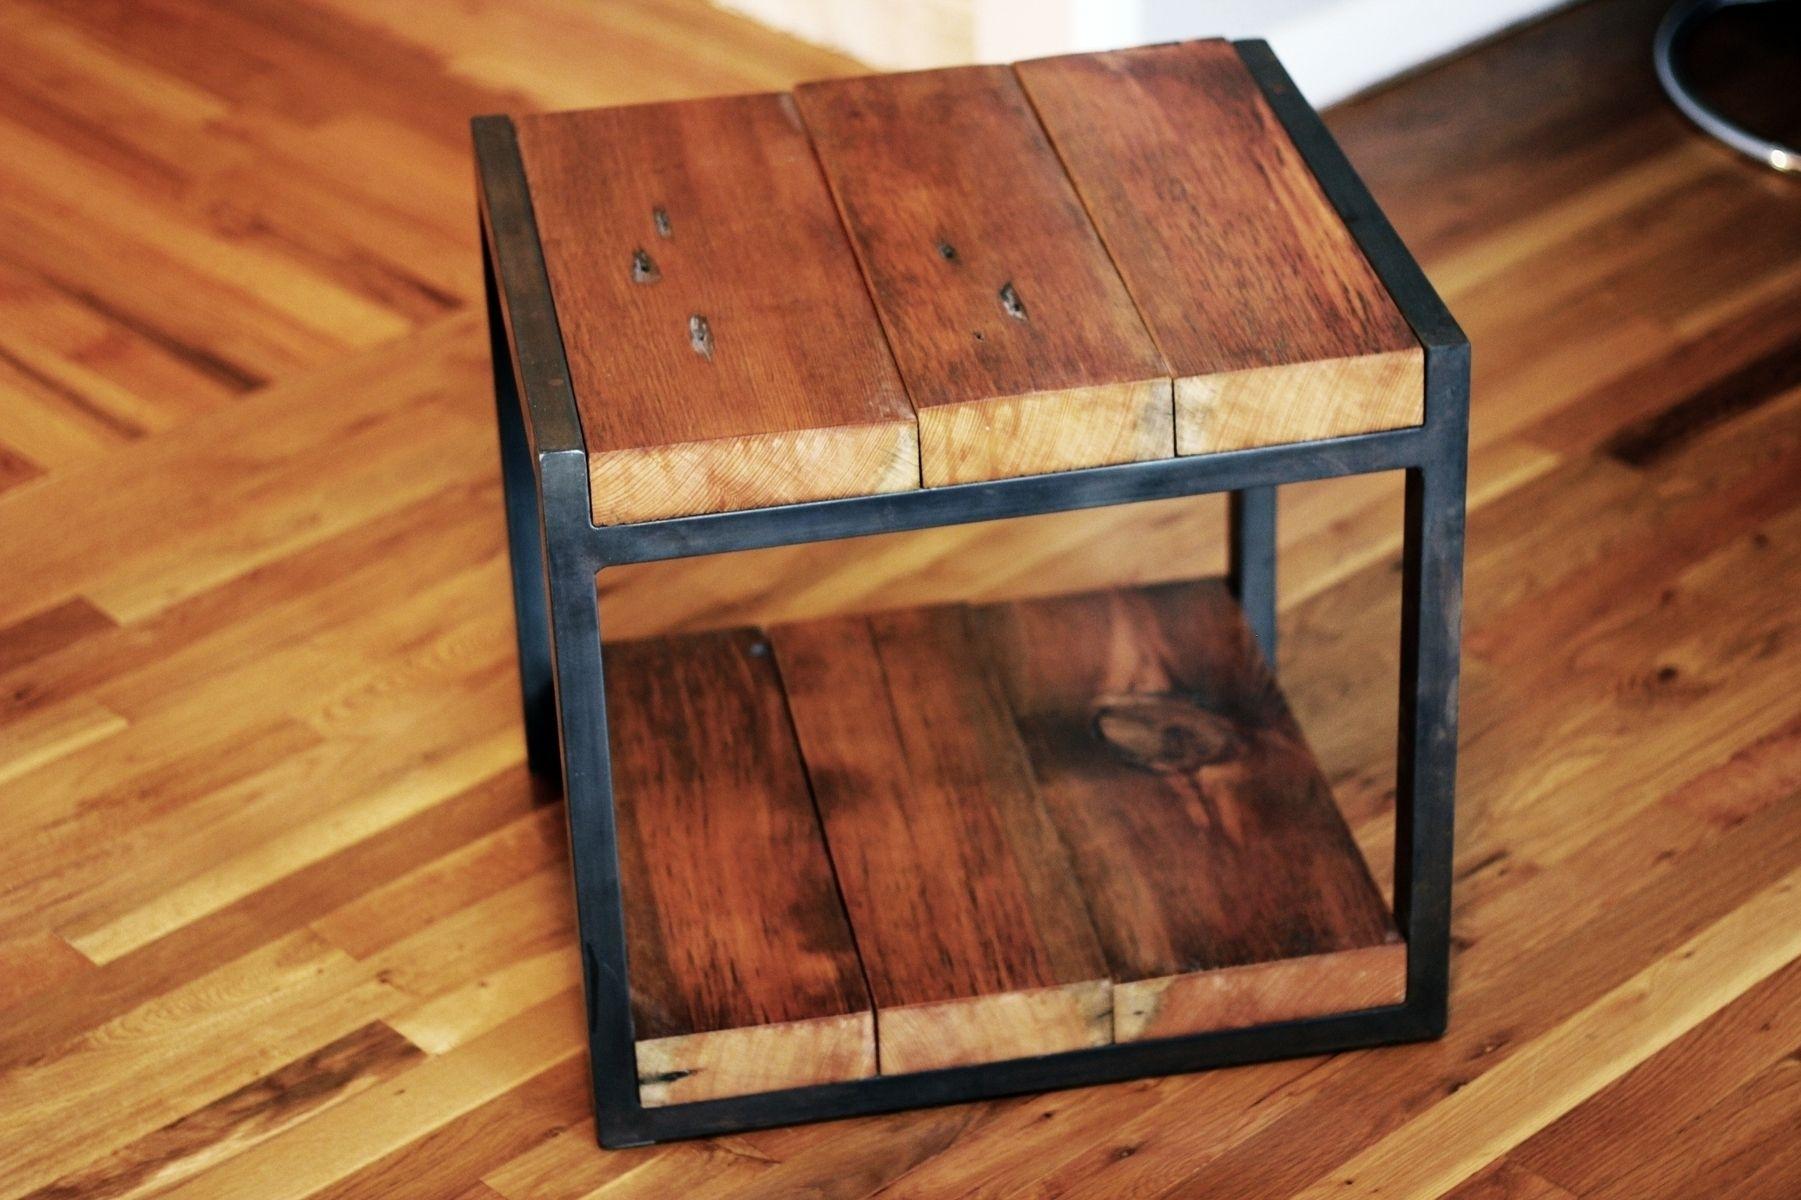 Custom Reclaimed Wood, Steel Side Tablebarreto Studios intended for Metal Framed Reclaimed Wood Sideboards (Image 10 of 30)